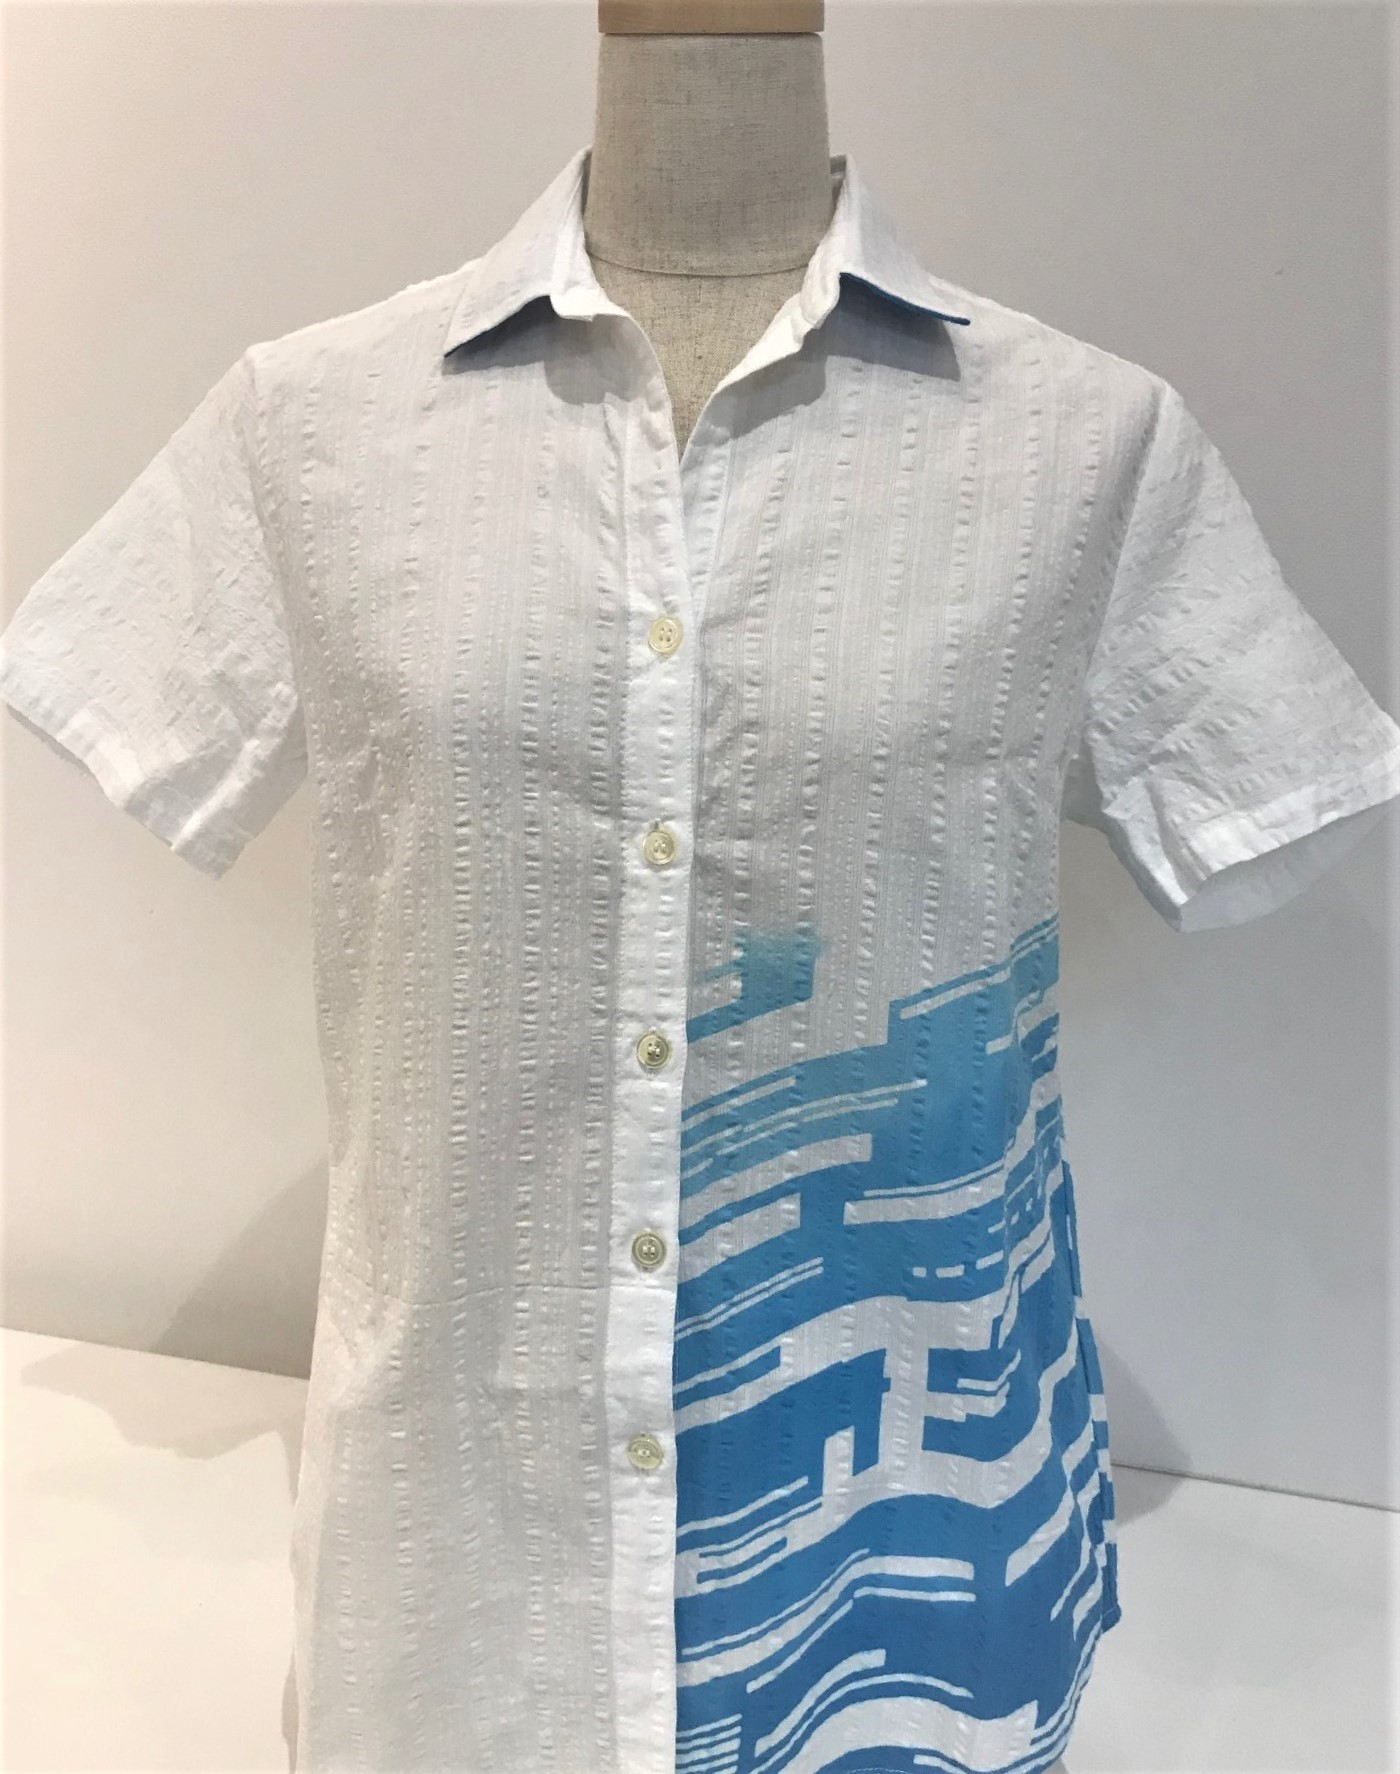 【堺注染和晒興業会】注染シャツ2020年(女性用)